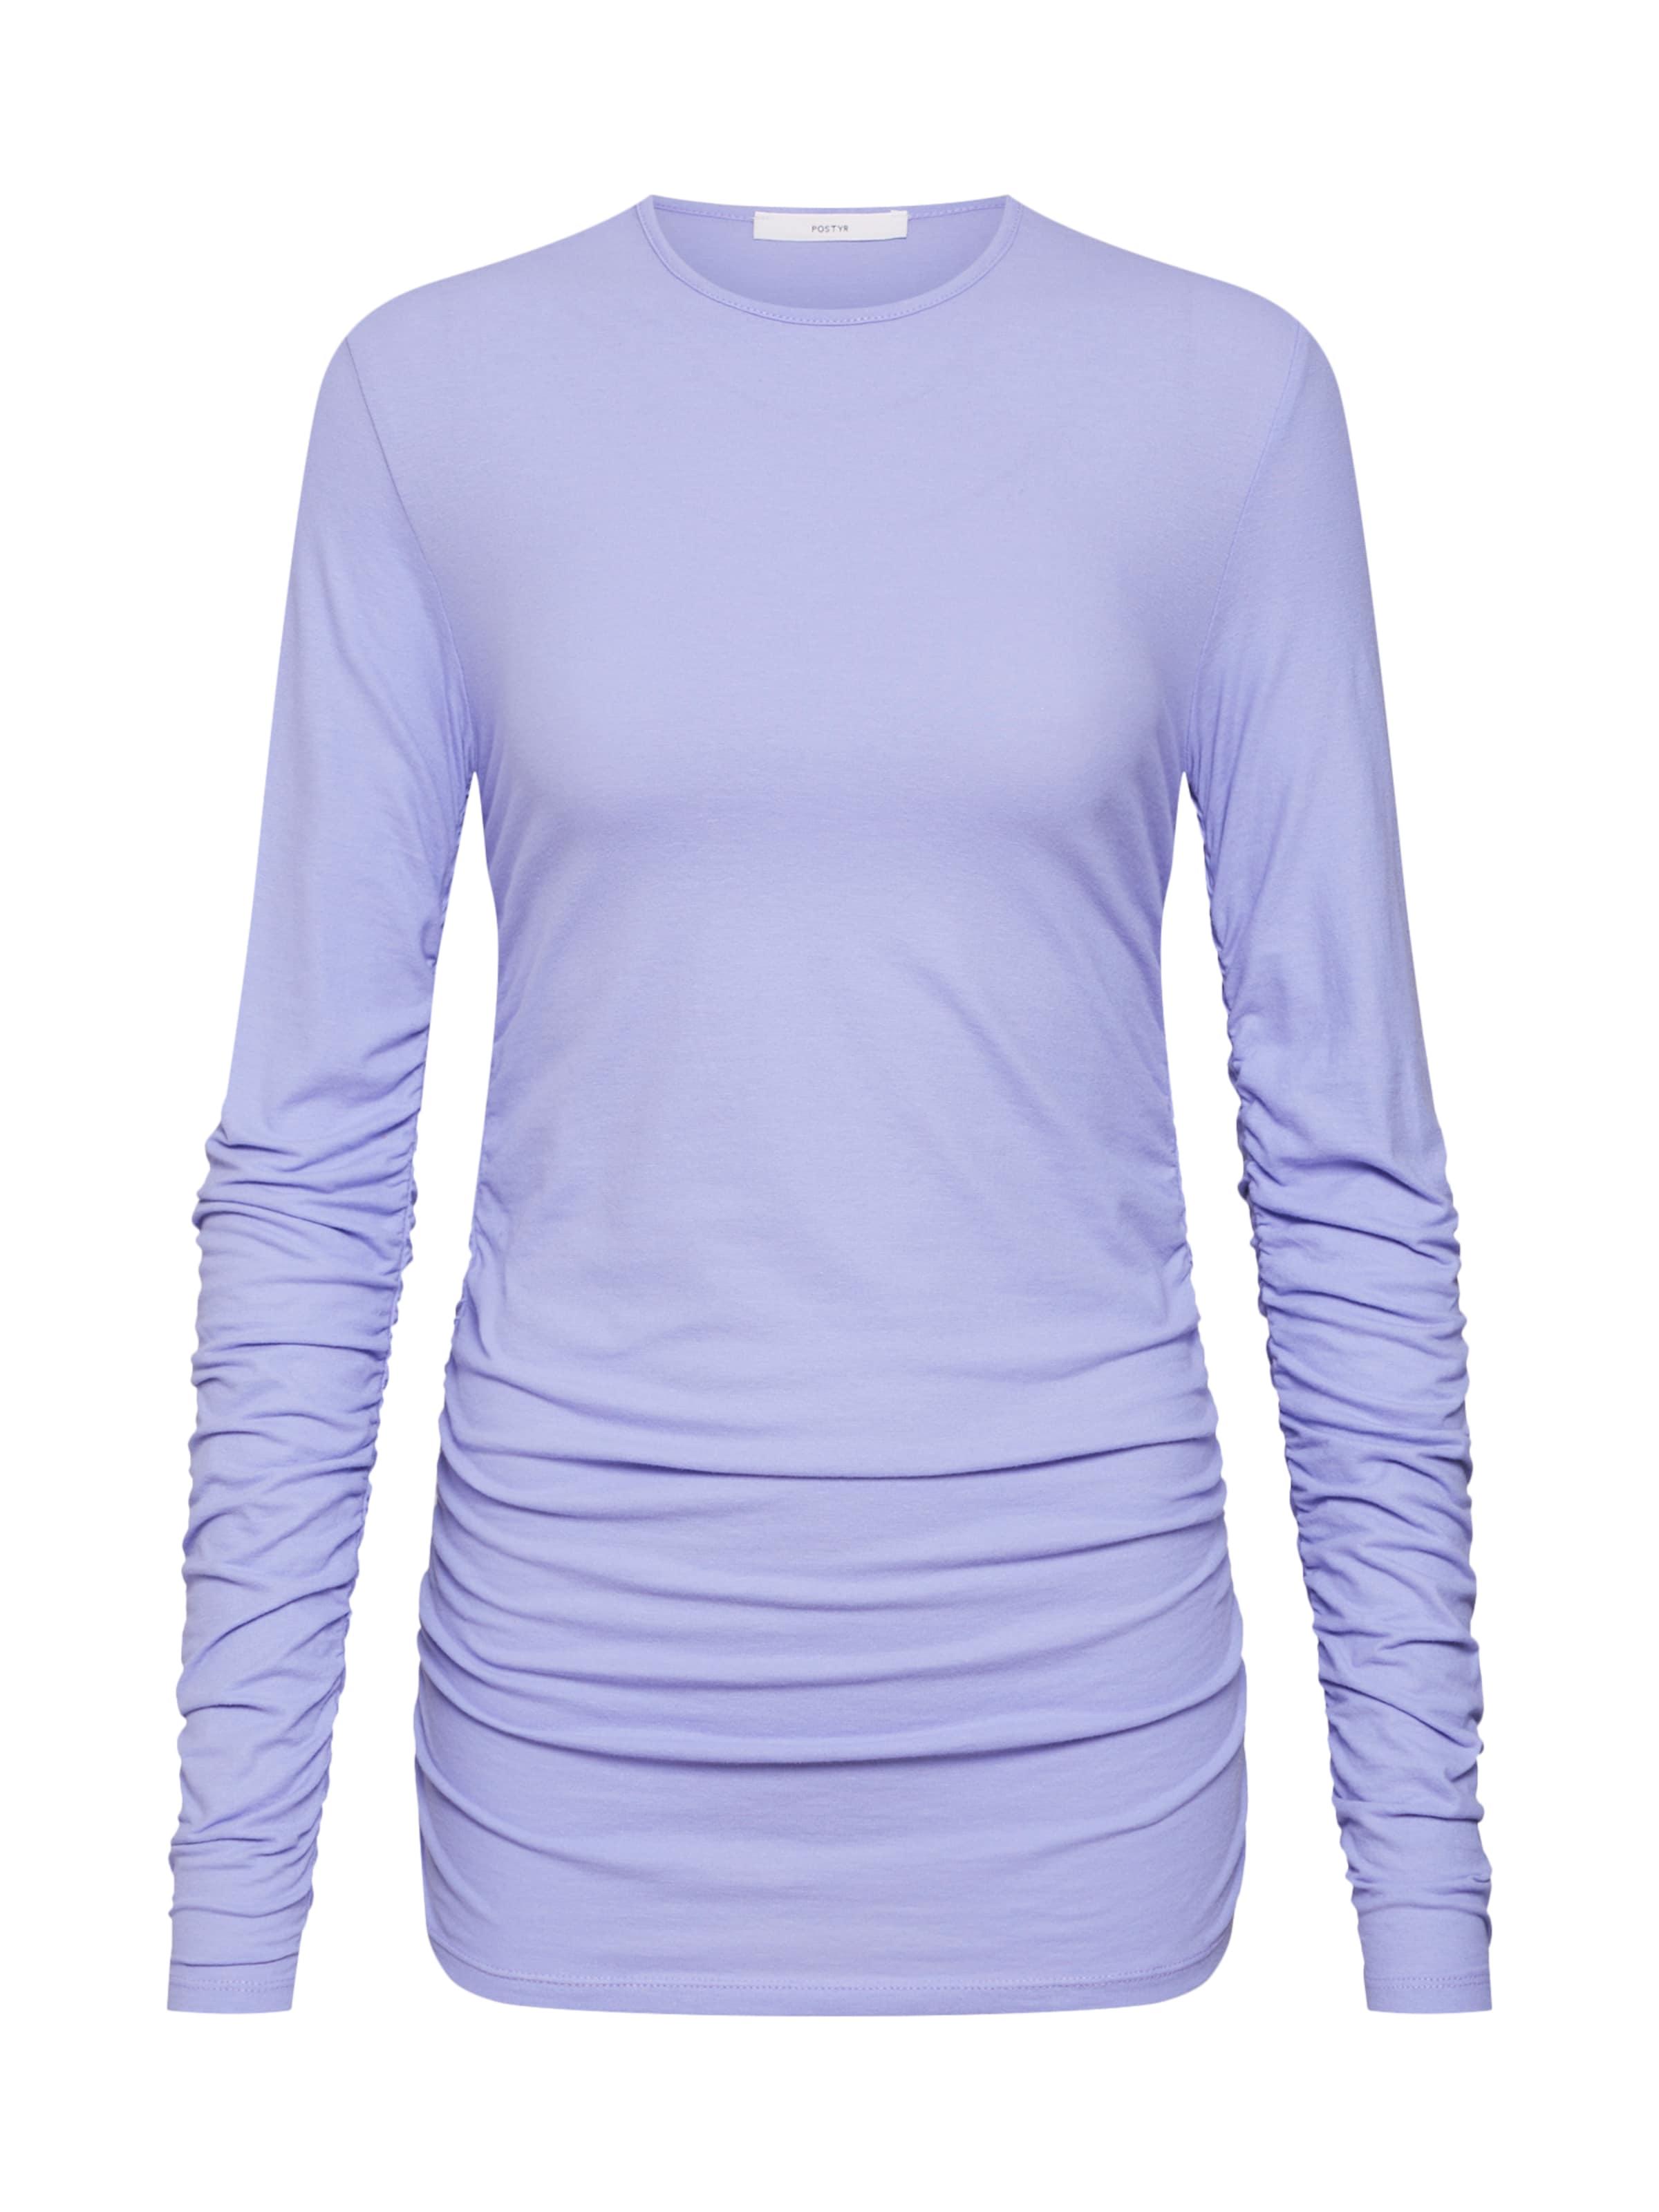 BleuViolet T Postyr En Postyr T shirt shirt uJTclFK13